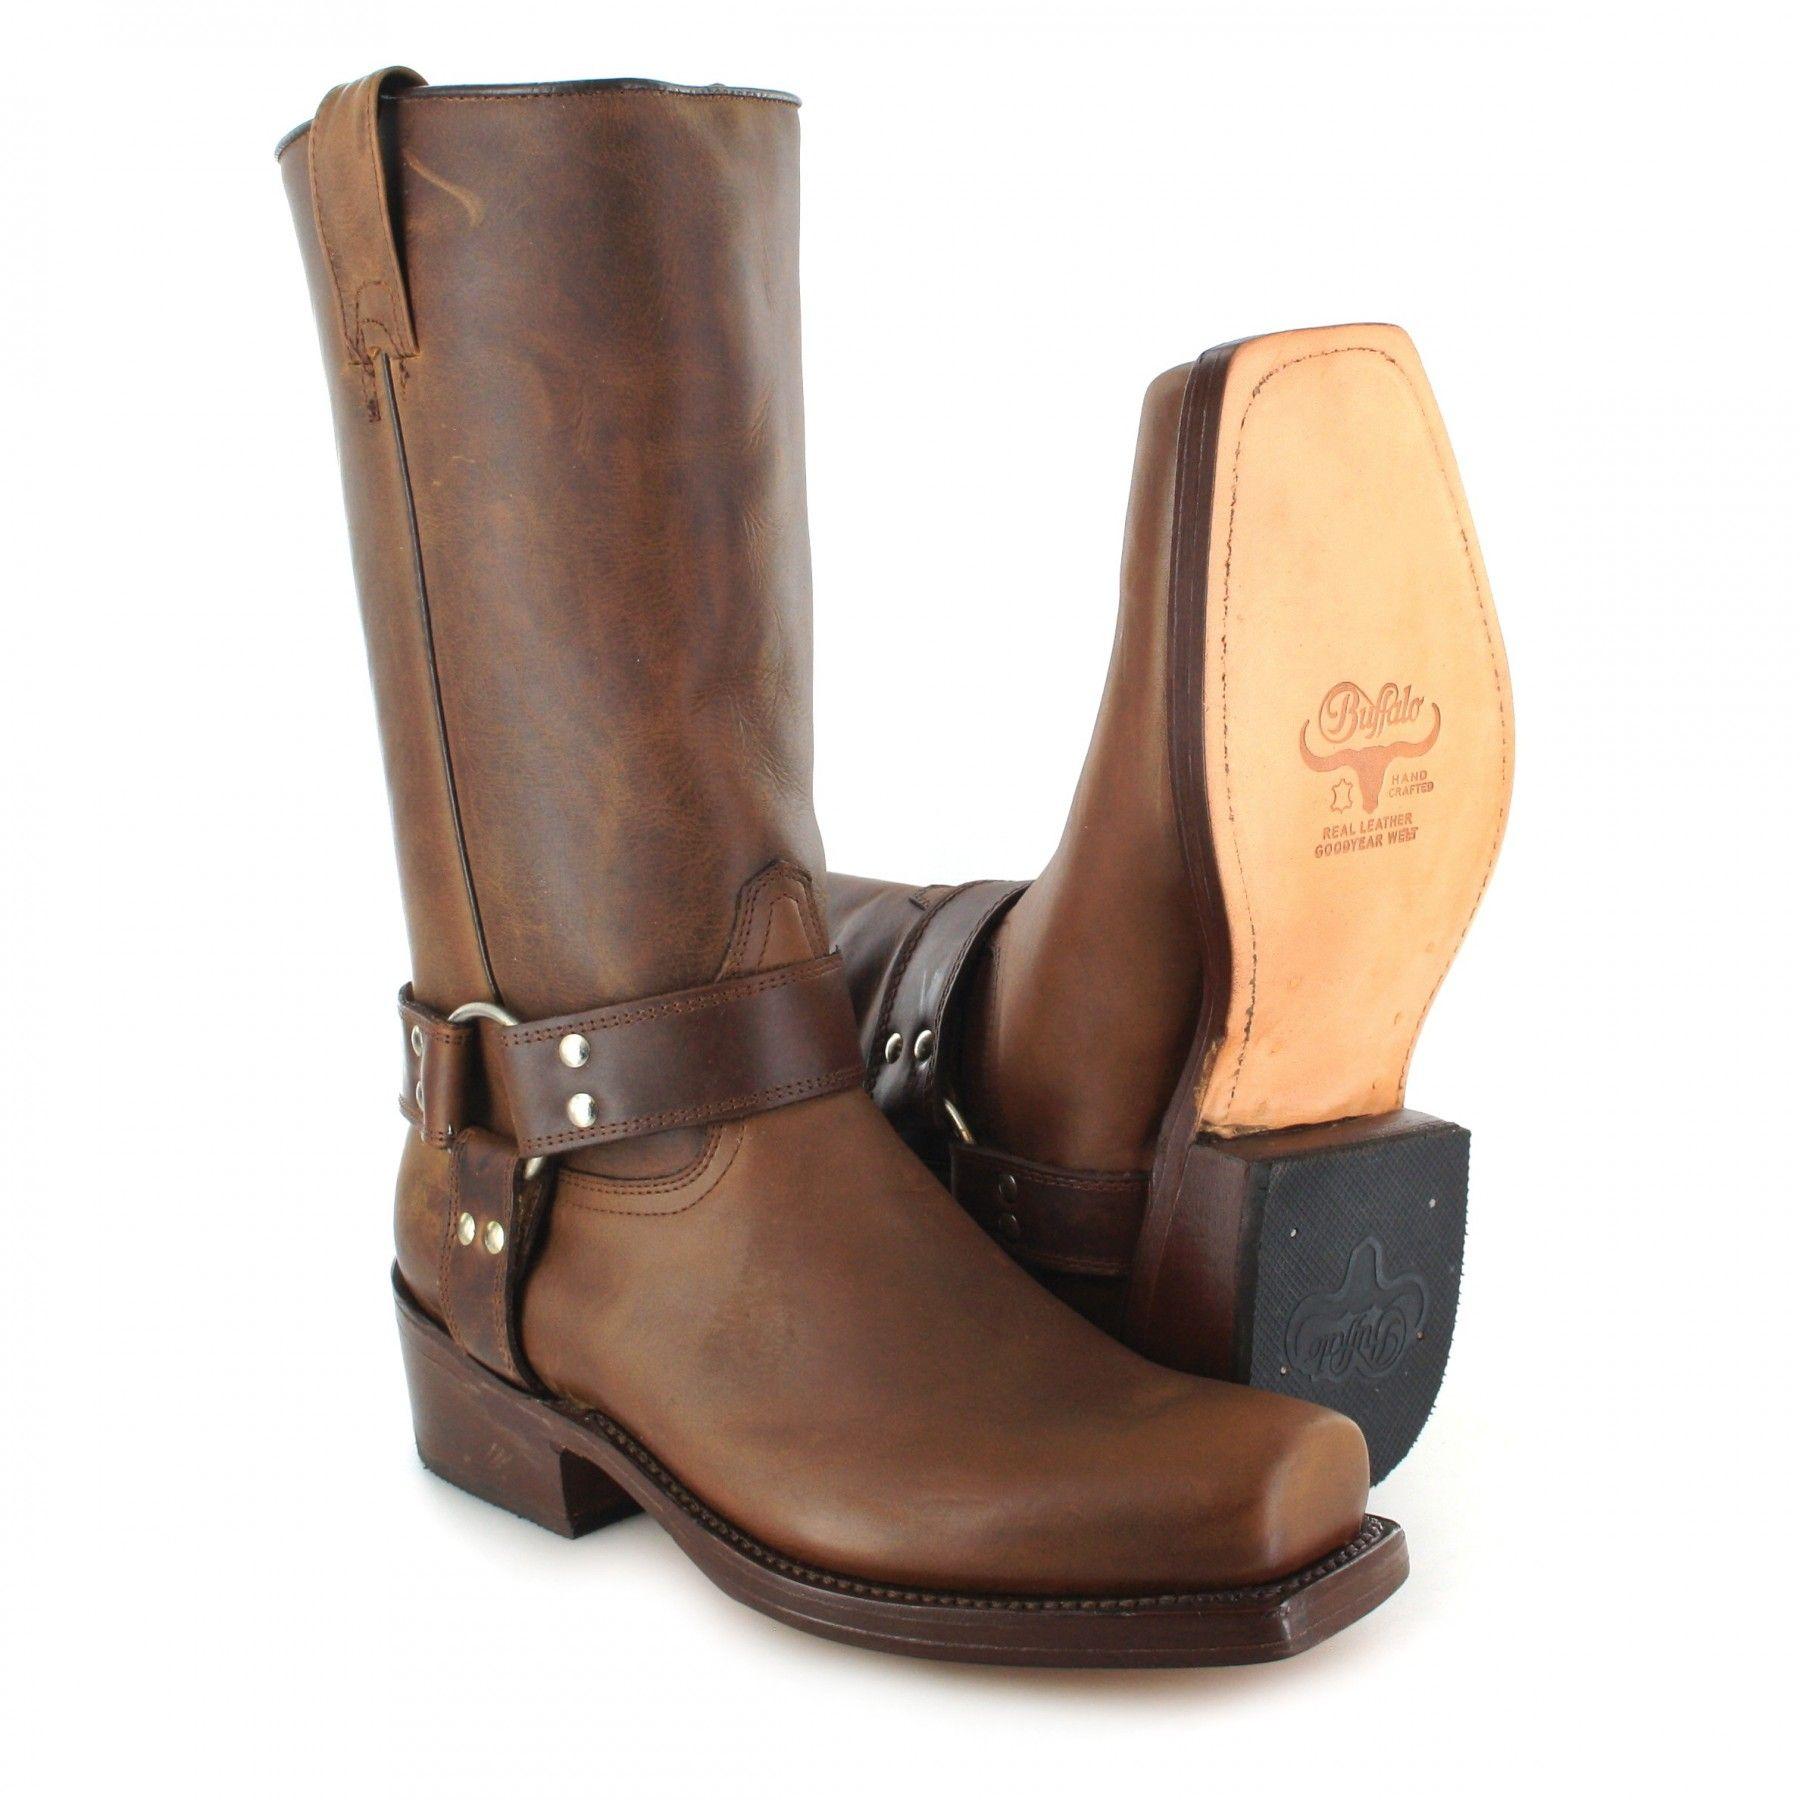 sale retailer 77eae 90bce Buffalo Boots 1801 Bikerstiefel - braun | Klassischer Damen ...